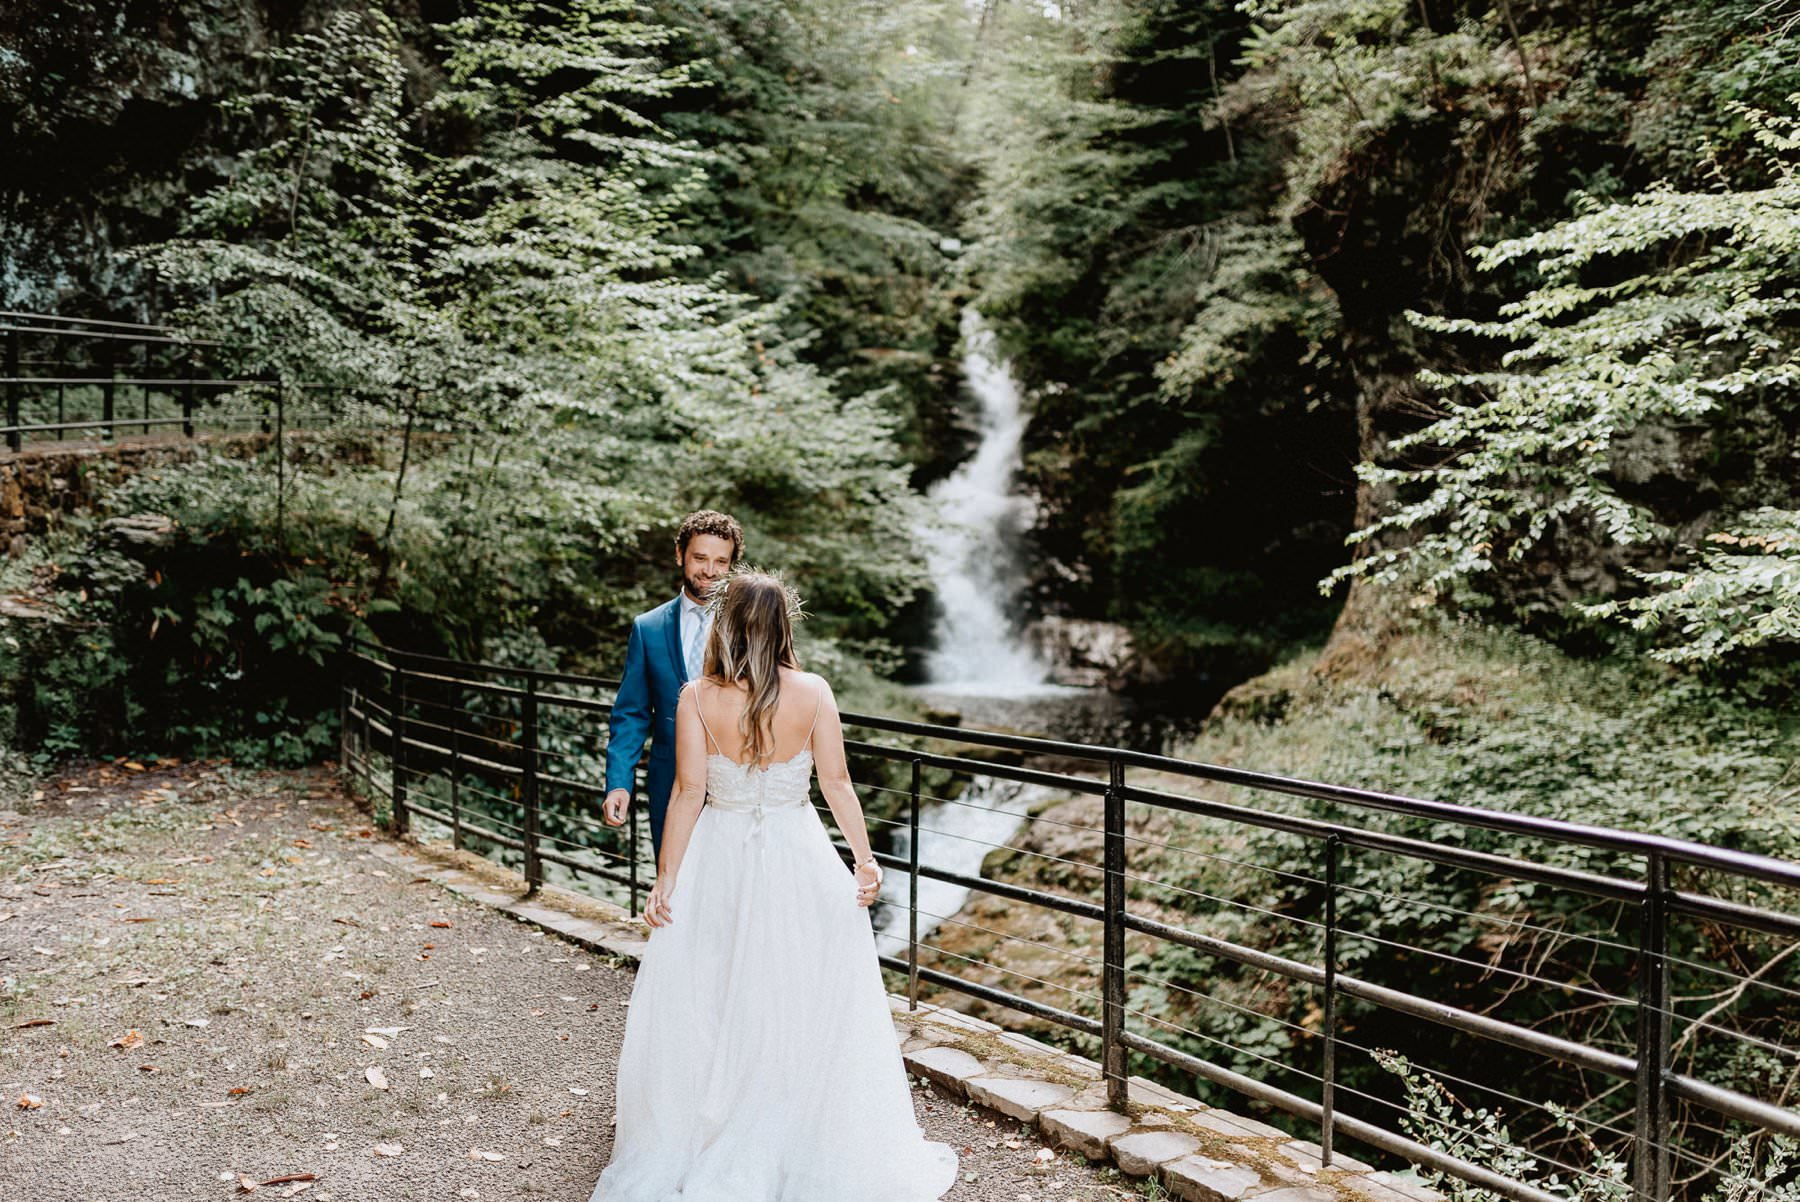 016-Tall-timber-barn-wedding-16.jpg